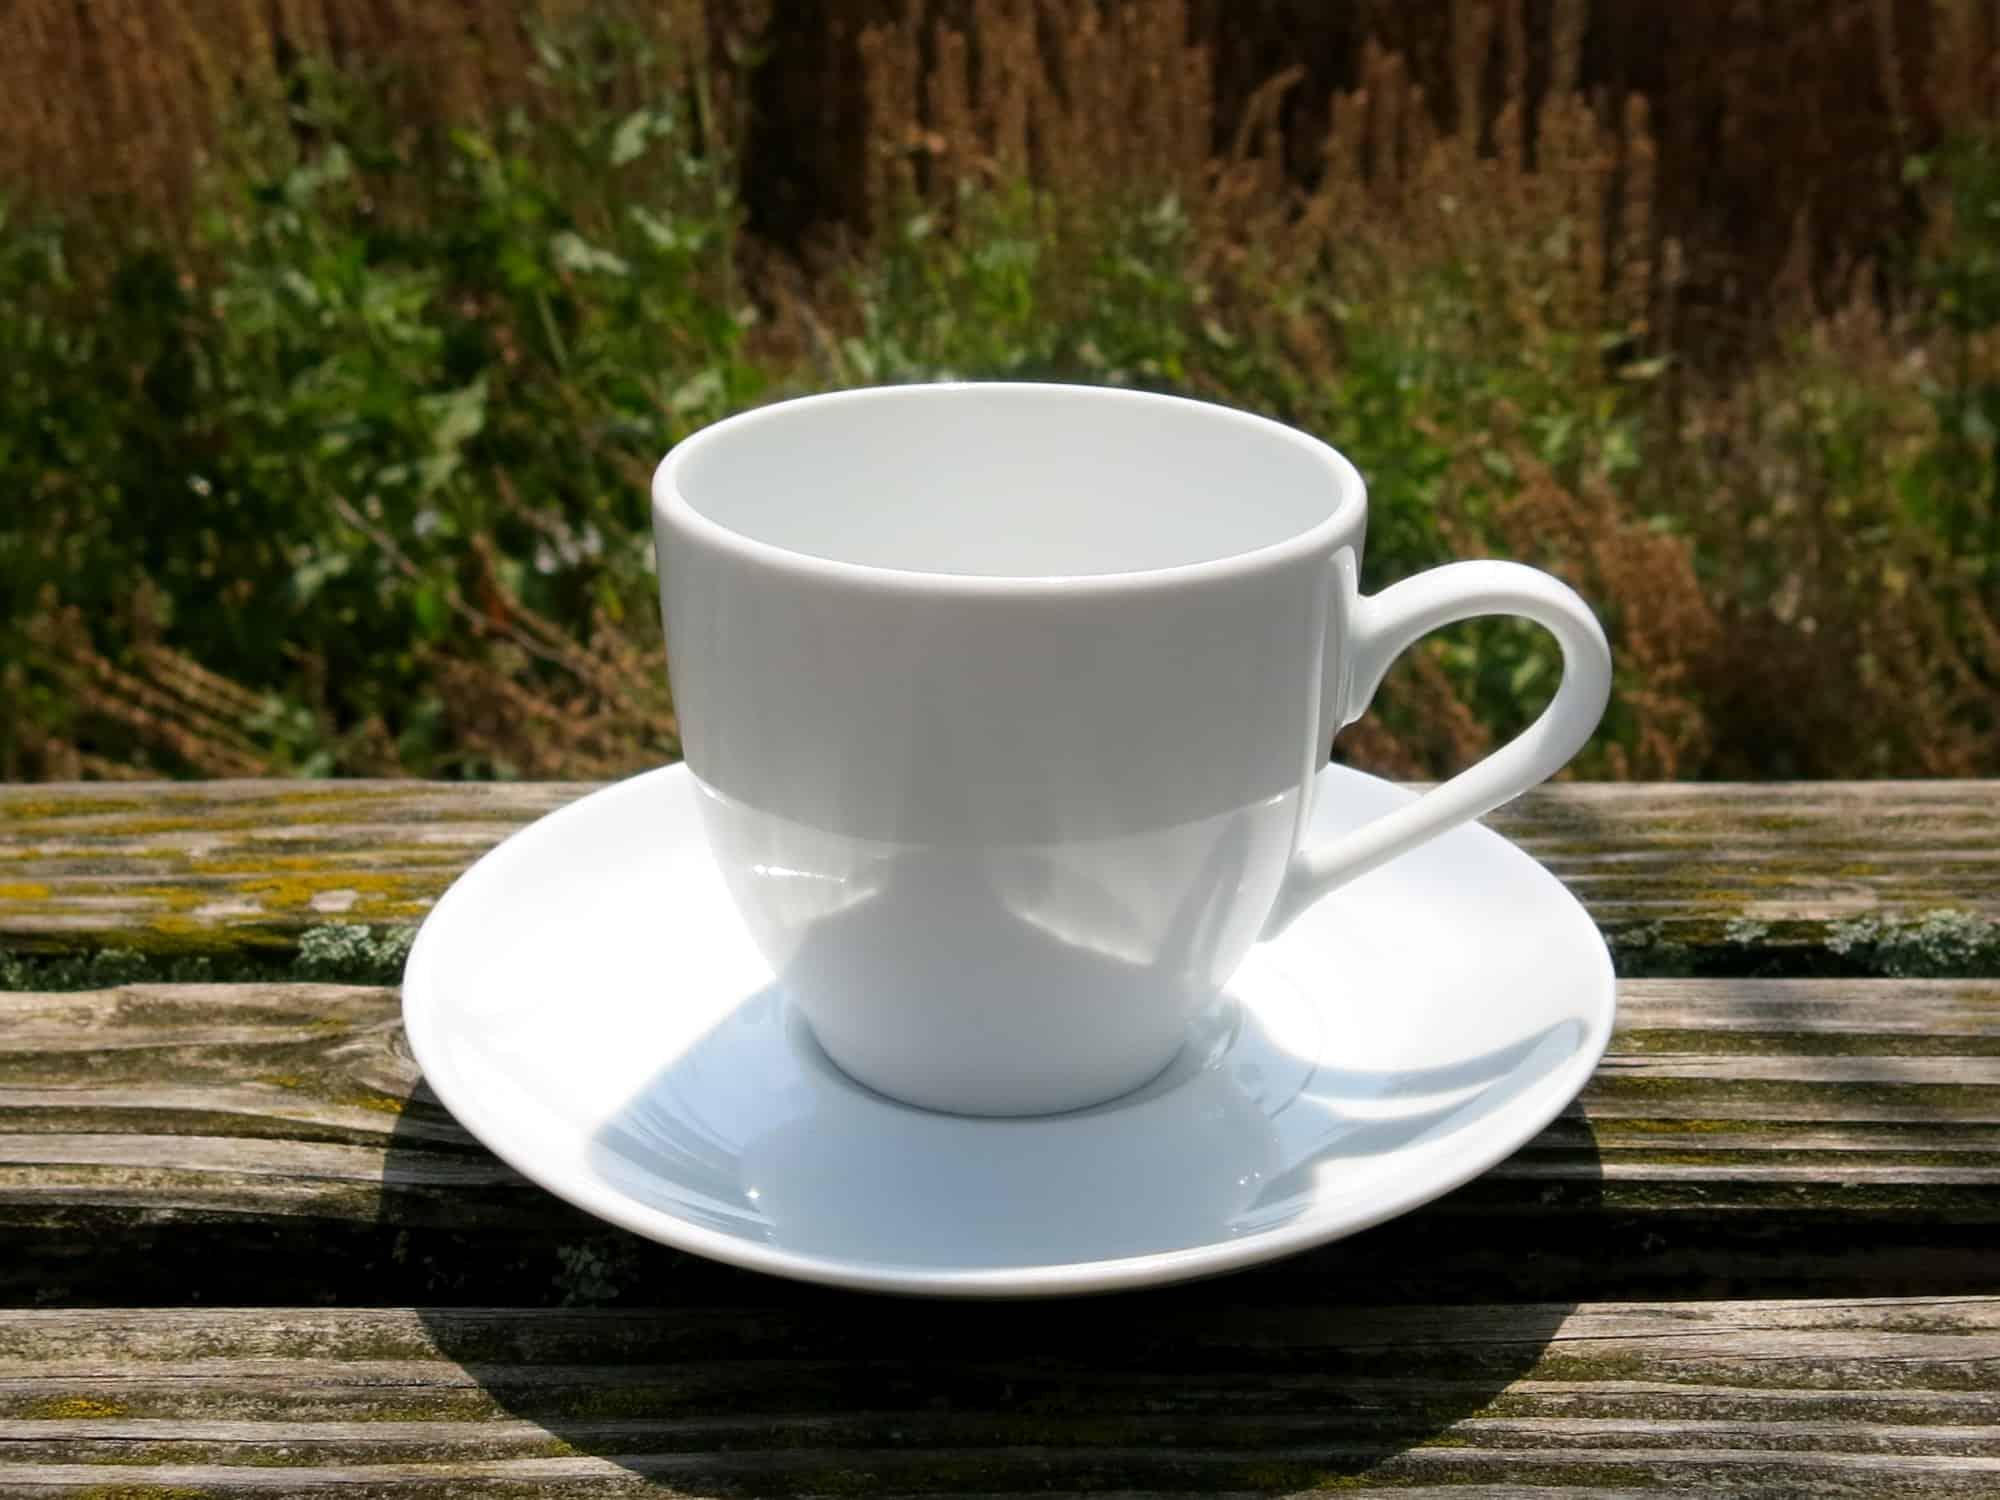 Kaffeetasse Ole 190 ml mit Untertasse Abb.ohne Oliven